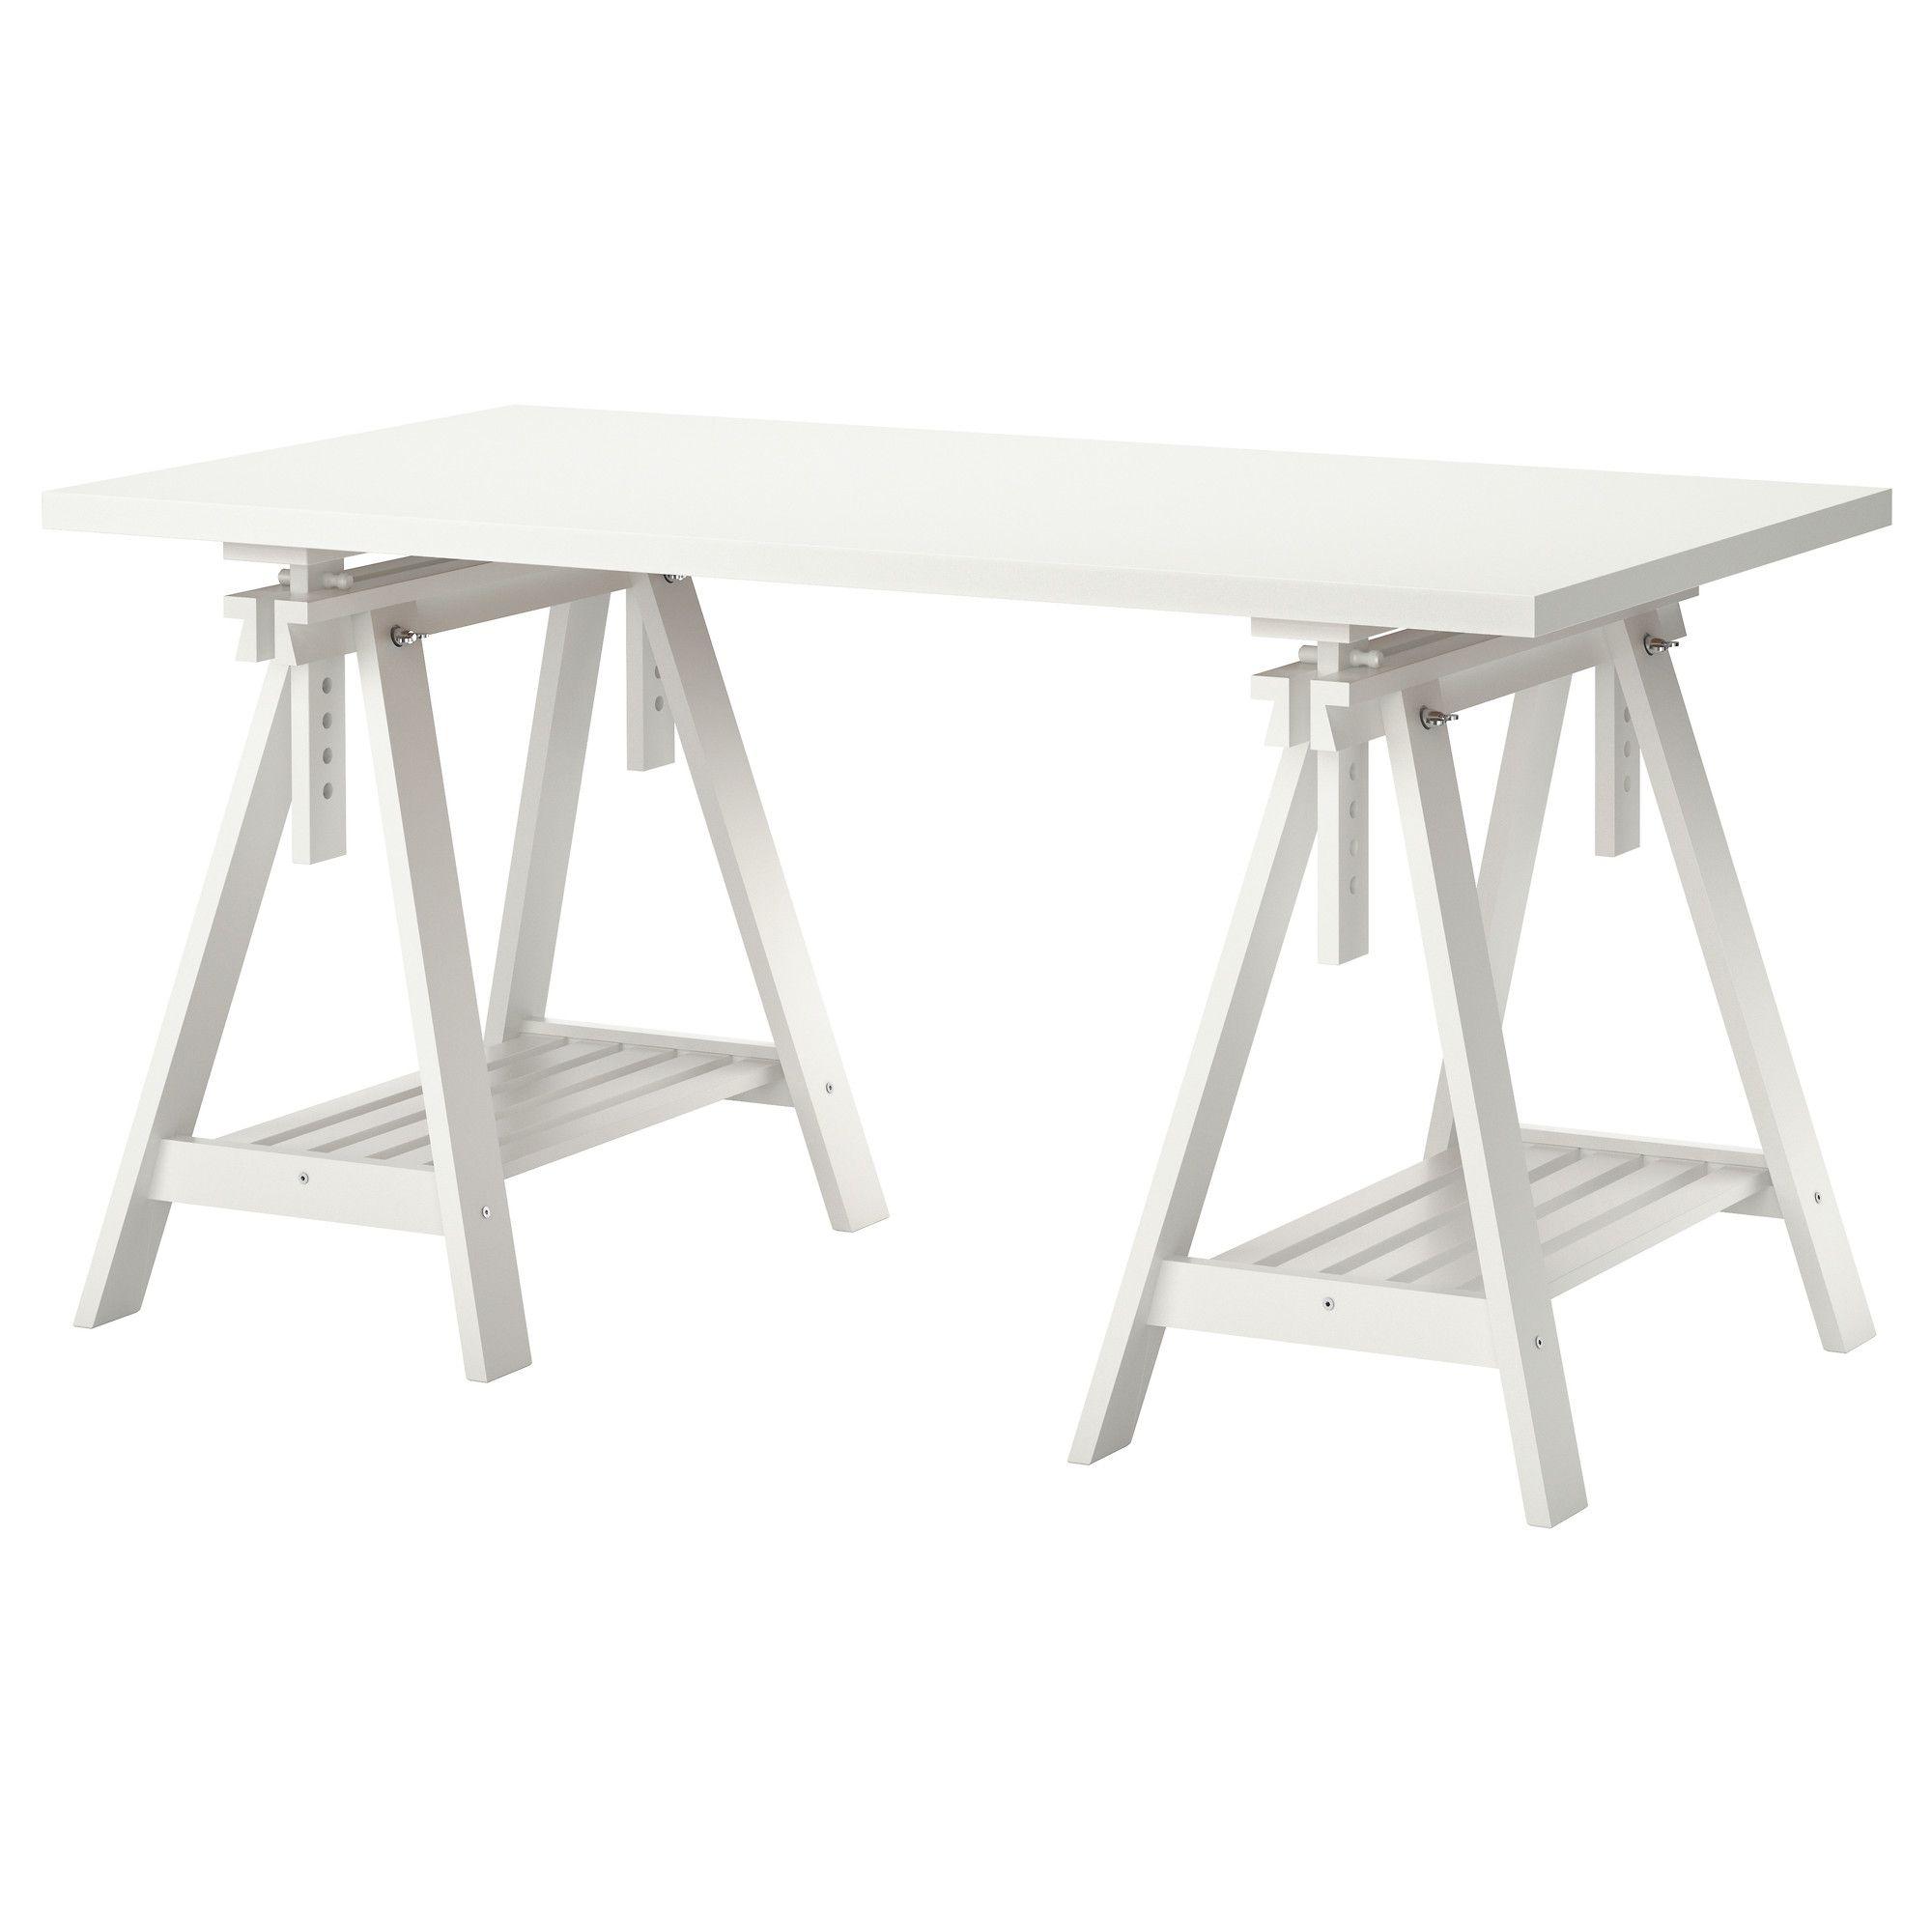 Eckschreibtisch weiß ikea  LINNMON / FINNVARD Tisch, weiß | Ikea beine, Tisch weiß und Ikea